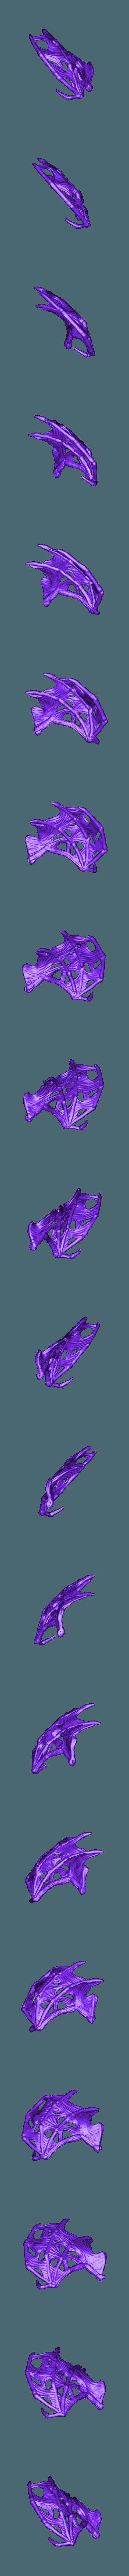 undead_dragon_right_wing.stl Download free STL file Undead dragon • 3D print model, schlossbauer